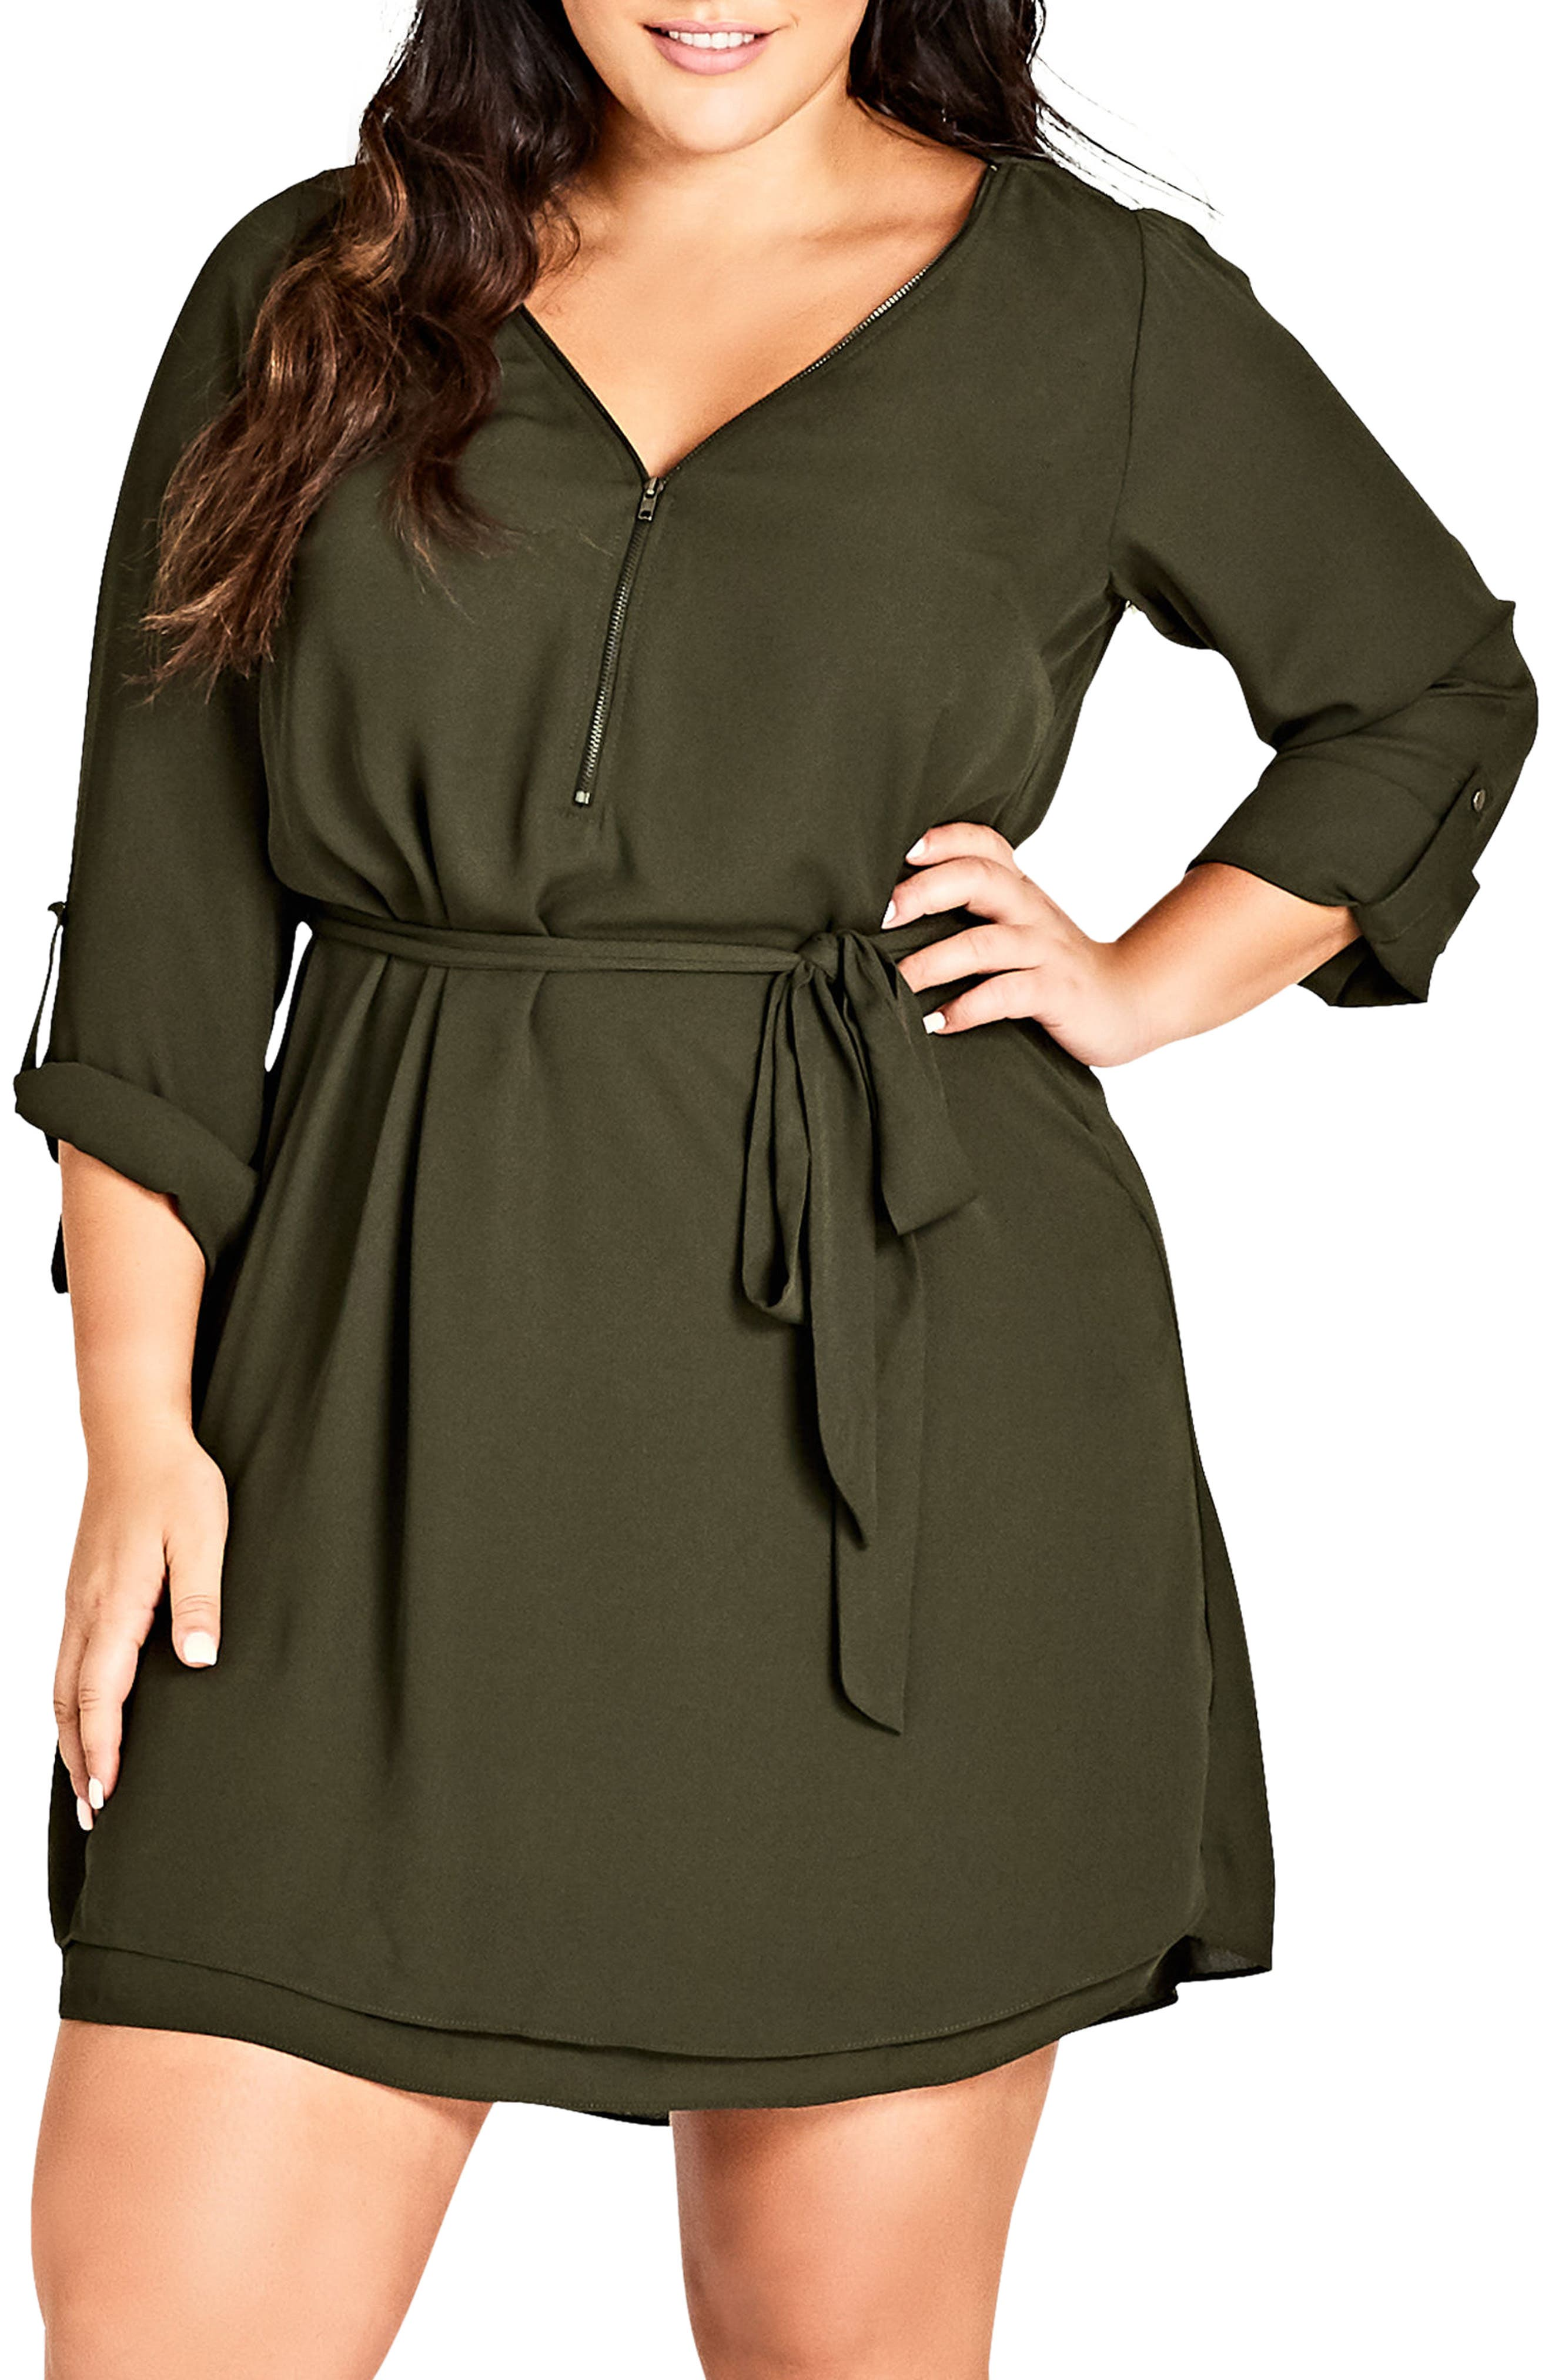 Zip Tunic Dress,                             Main thumbnail 1, color,                             311